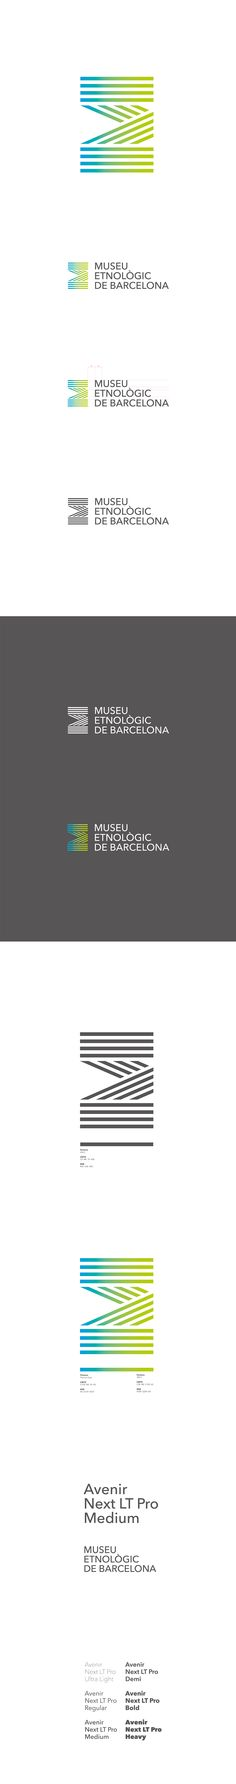 Museu Etnològic de Barcelona on Behance #Identity